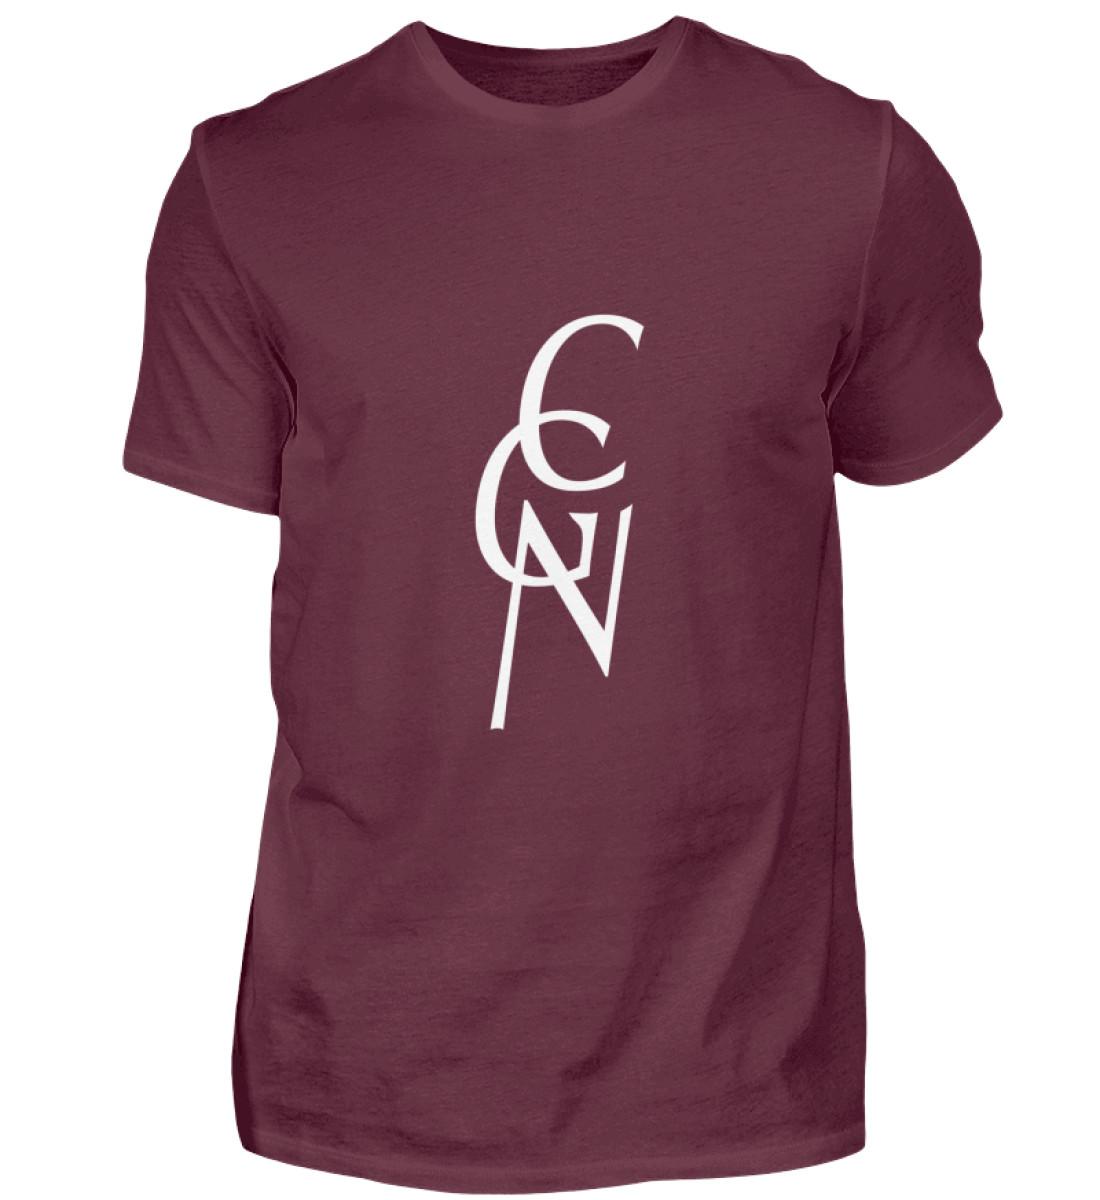 CGN - T-Shirt Herren - Herren Shirt-839